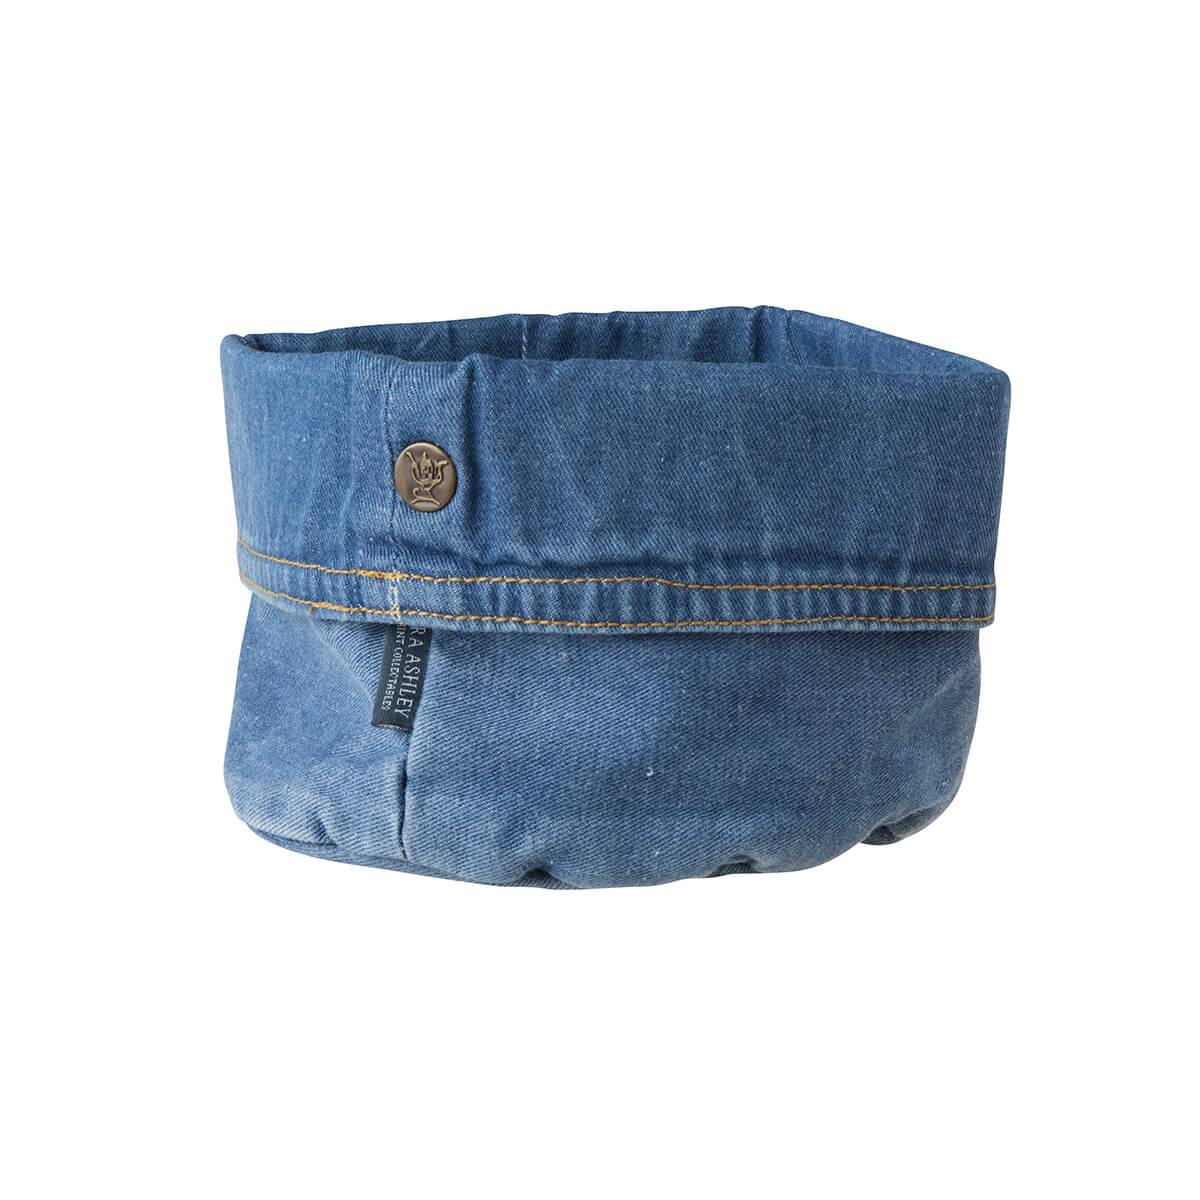 Онлайн каталог PROMENU: Тканевый мешок-хлебница Laura Ashley BLUEPRINT, 11х17 см, синий                               178447